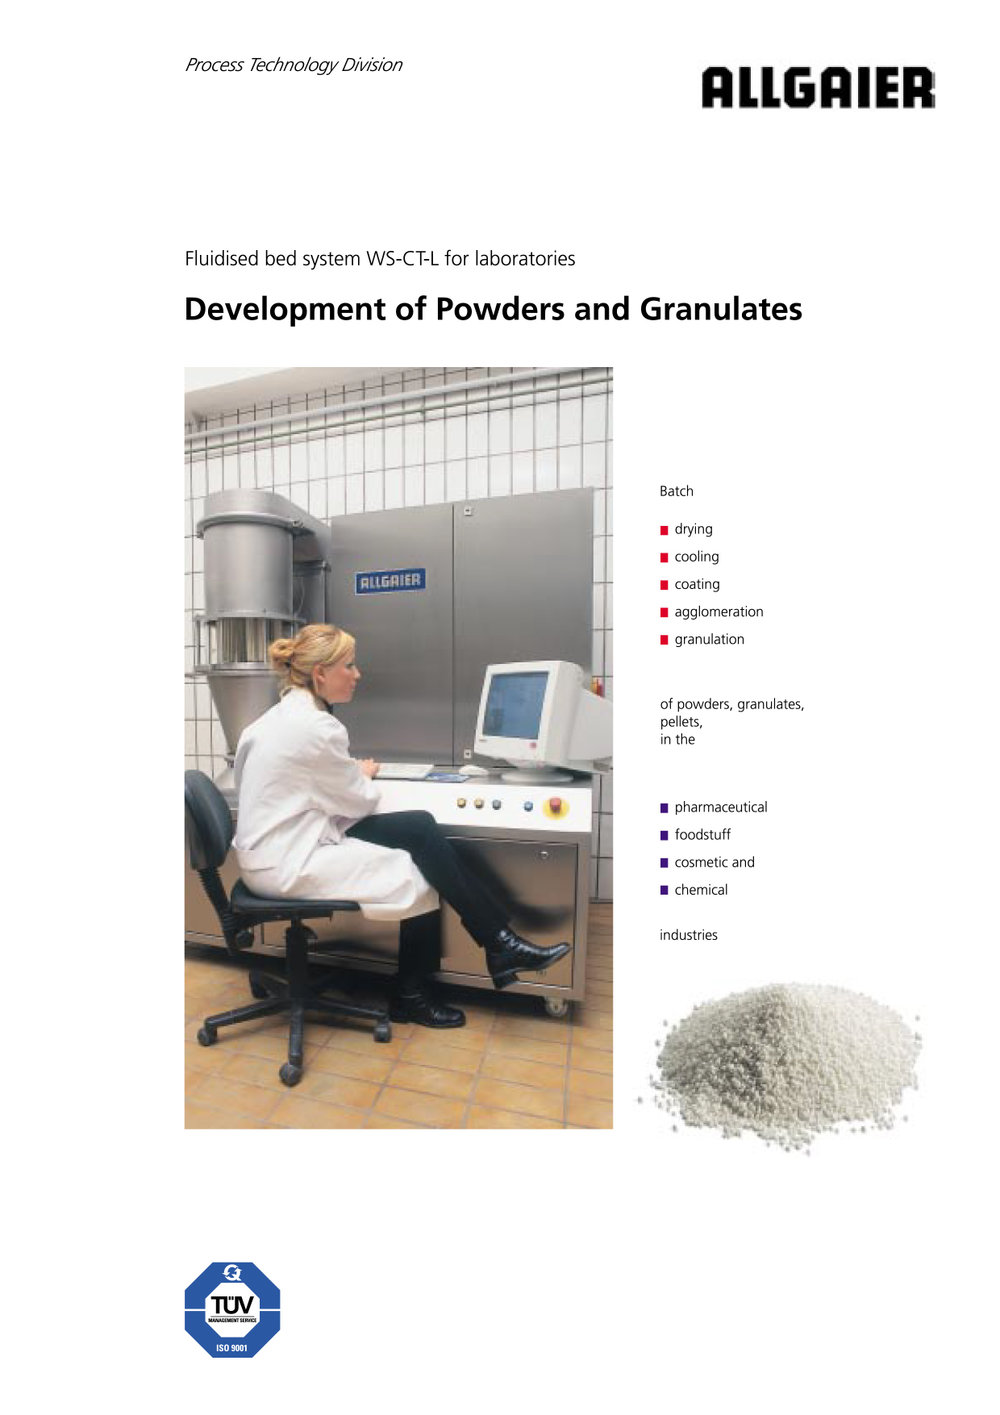 Development of Powders and Granulates